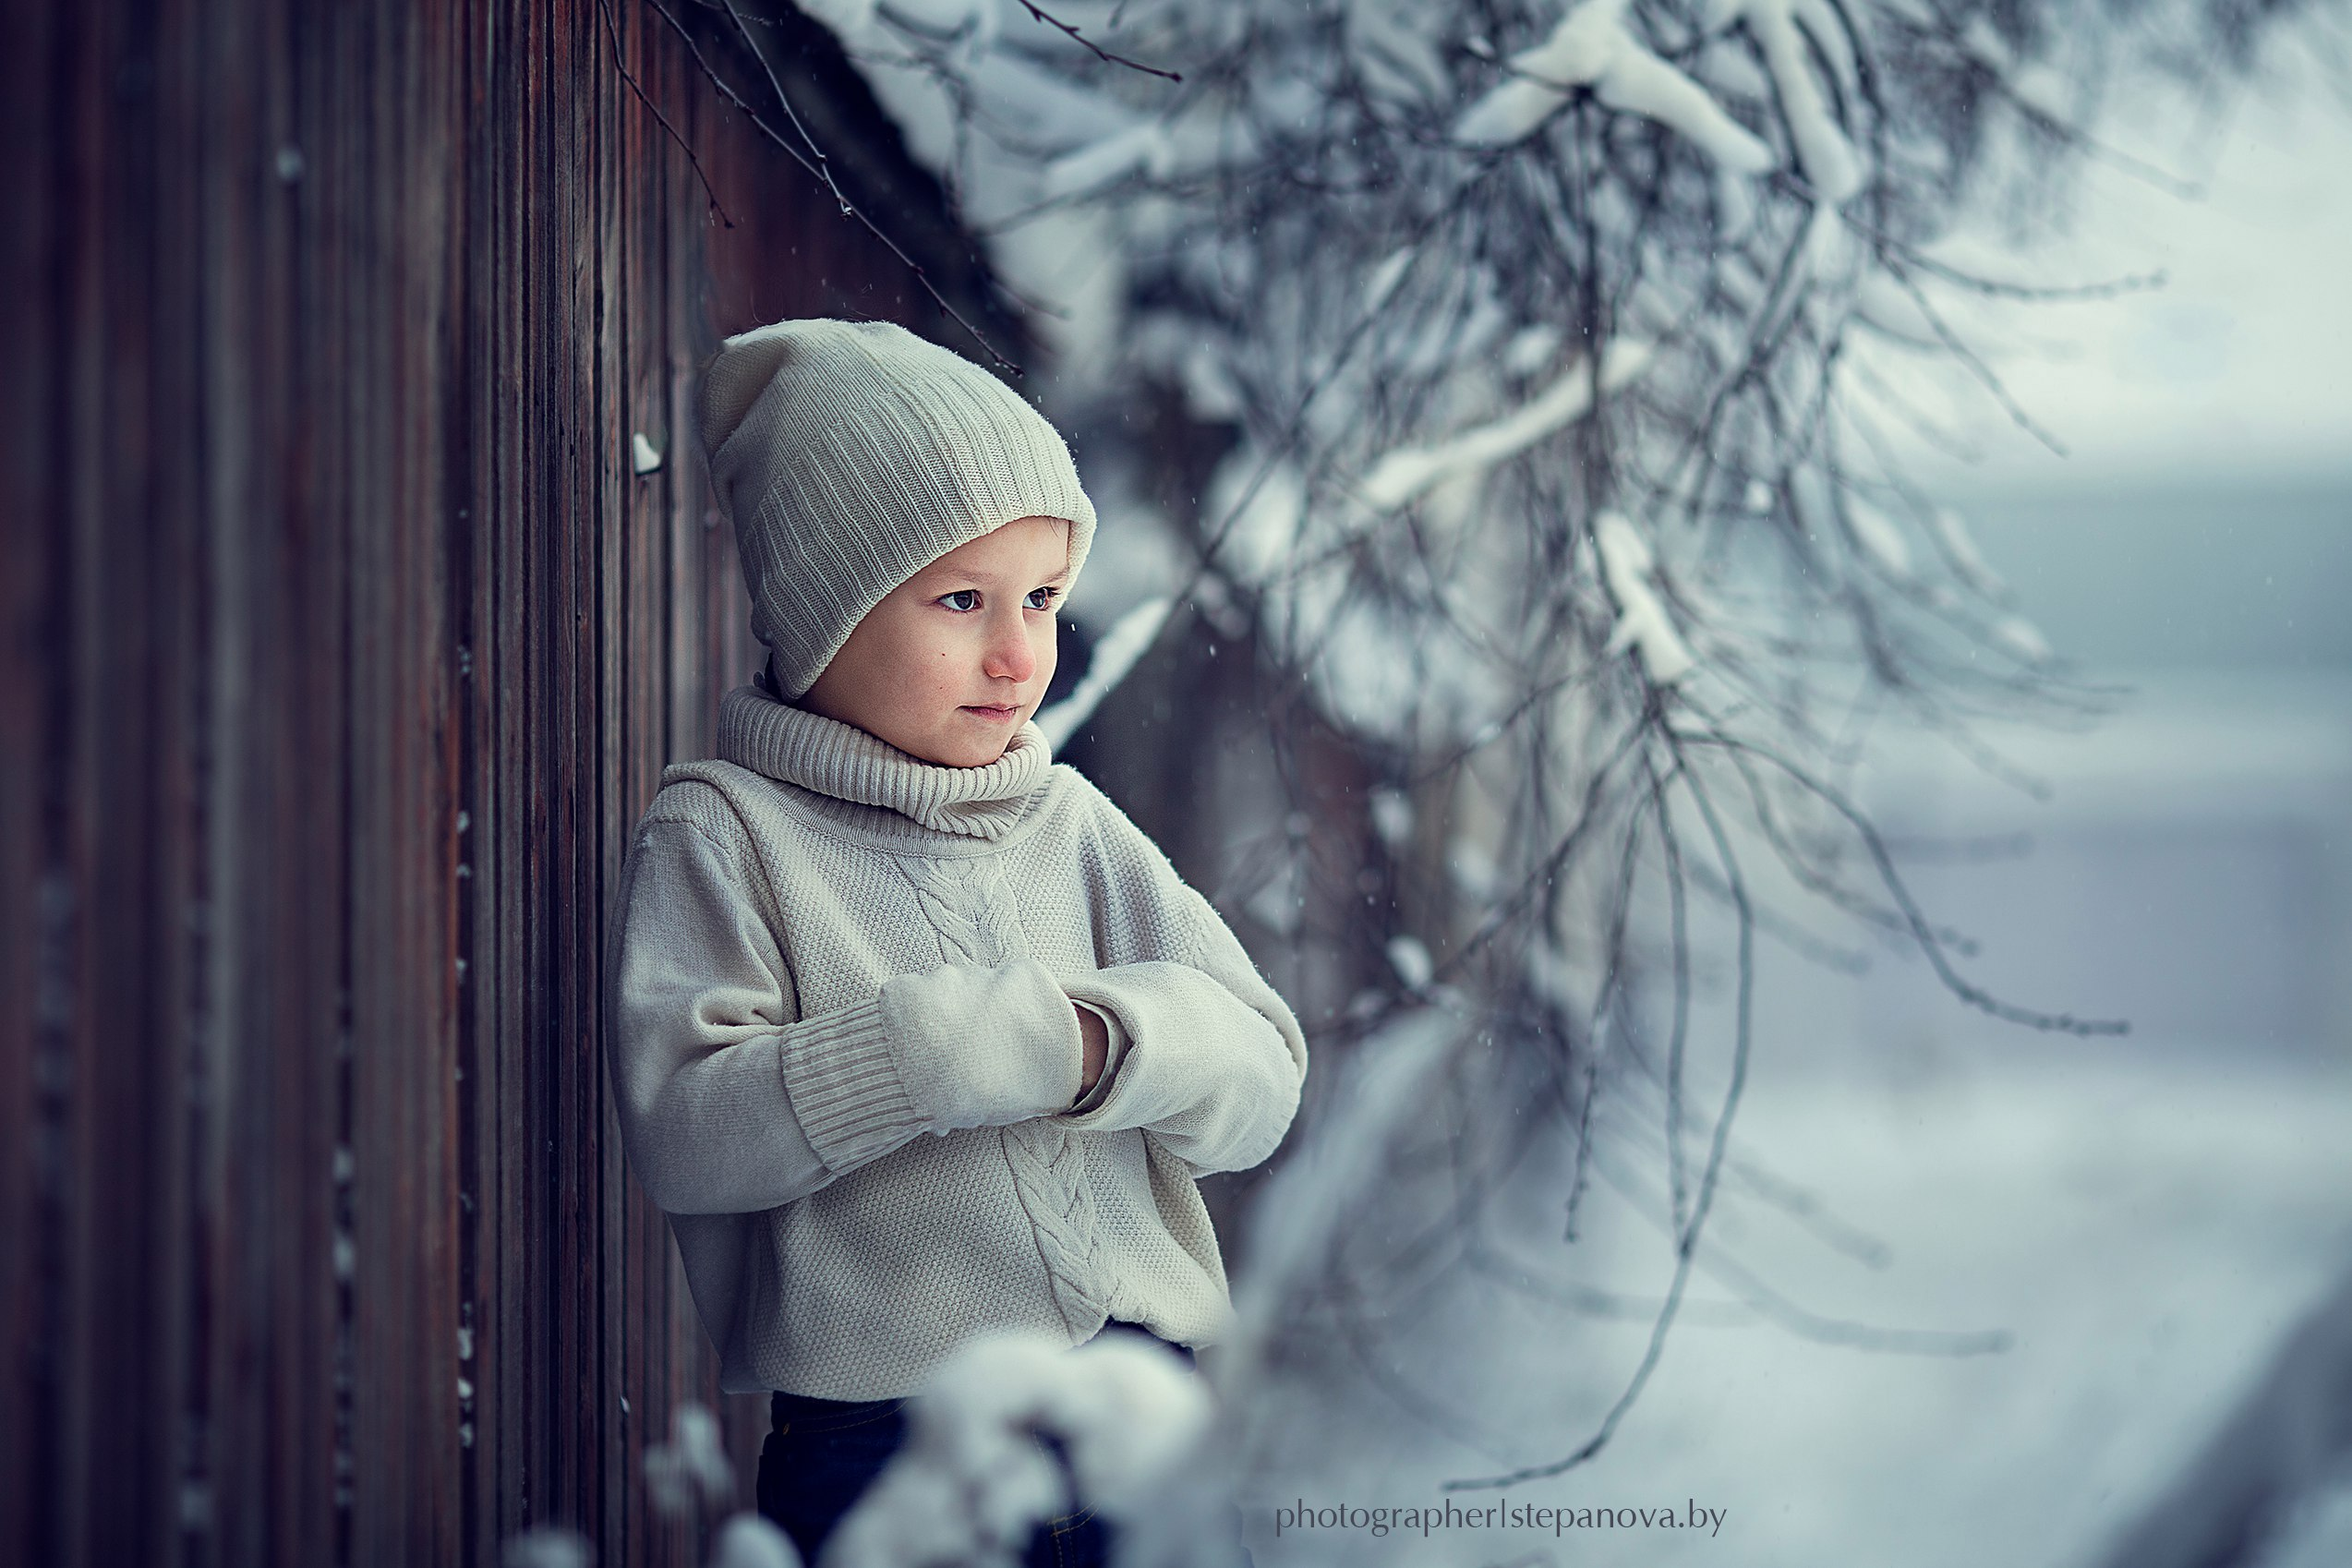 зима,ребенок,холод,снег,мороз, Степанова Дарья